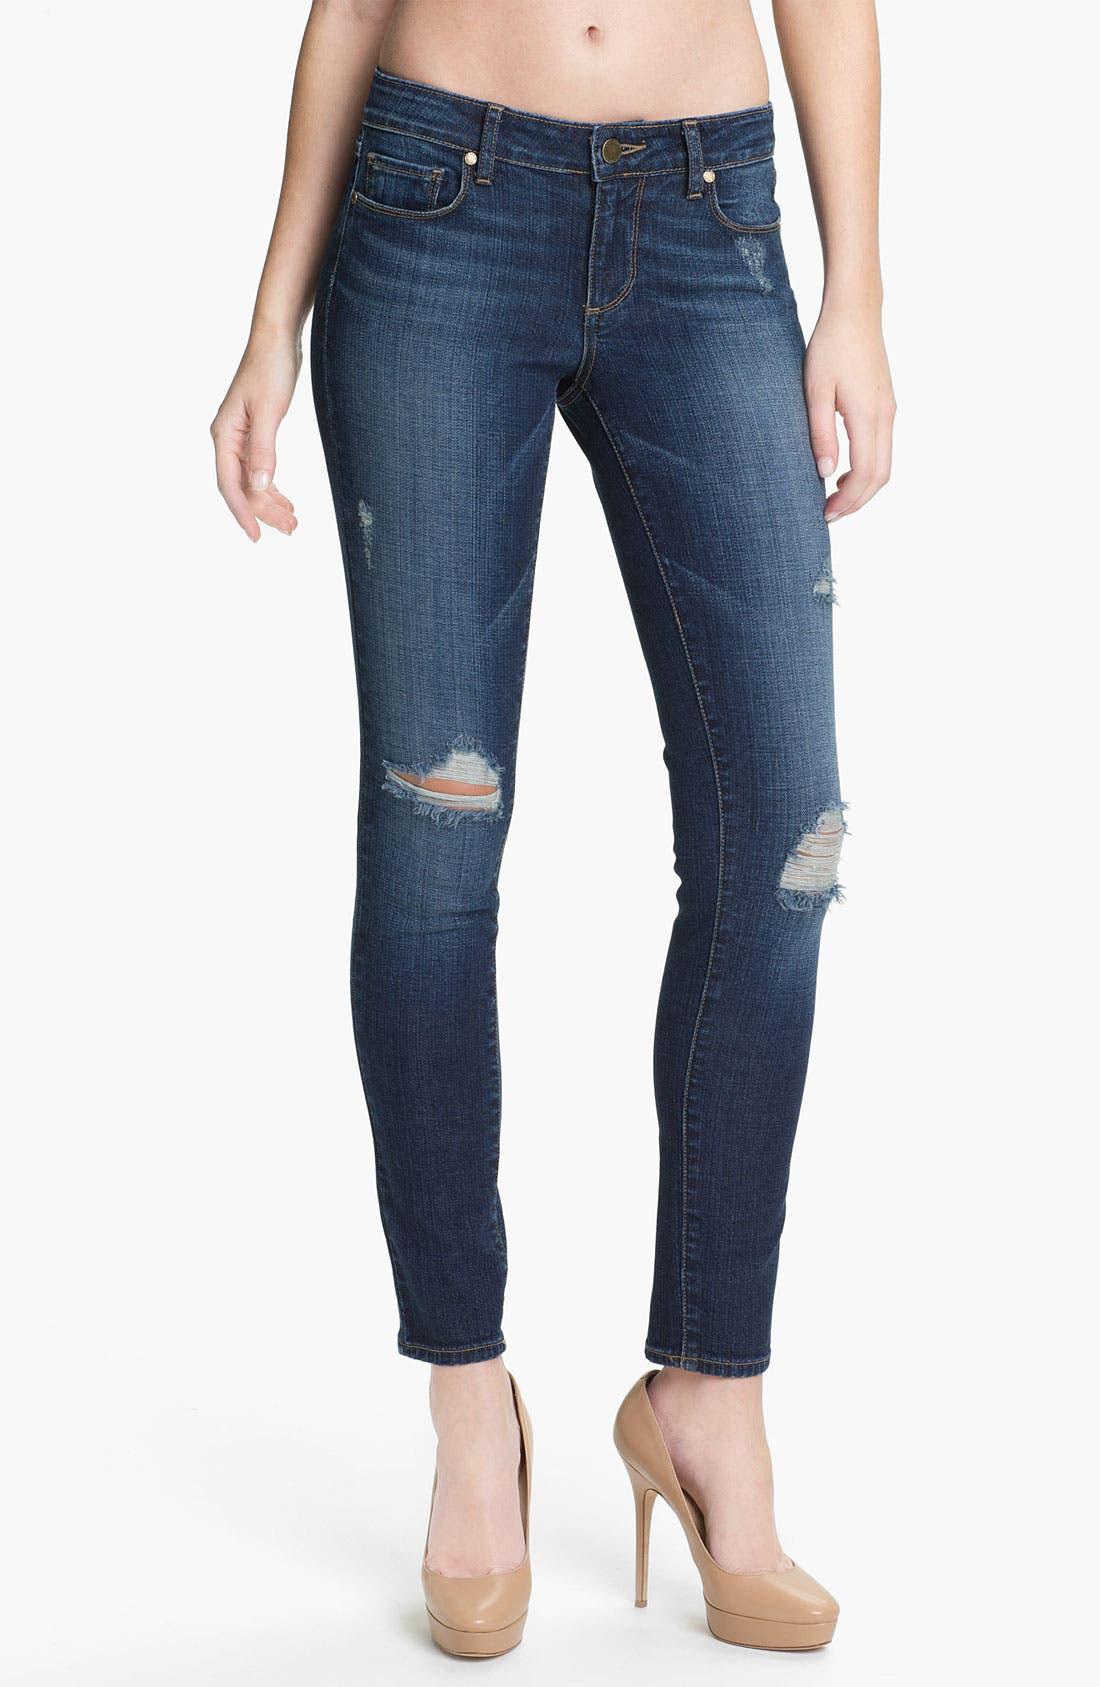 Alternate Image 1 Selected - Paige Denim 'Verdugo' Stretch Skinny Jeans (Decker)